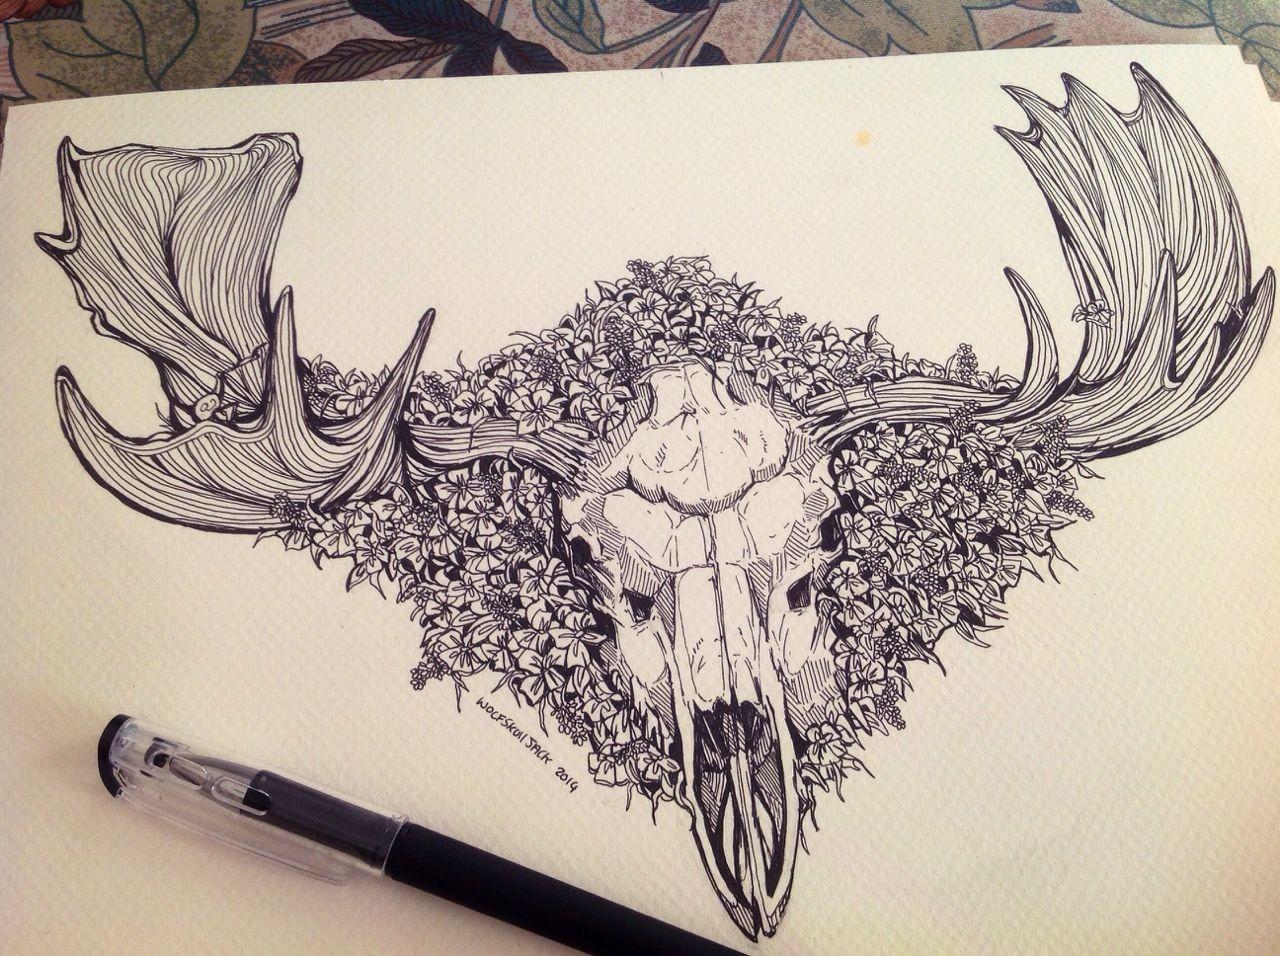 Moose Skull Commission In Progress For A Very Lovely Client Next Stop Is To Paint Moose Skull Skull Tattoo Design Animal Skull Tattoos